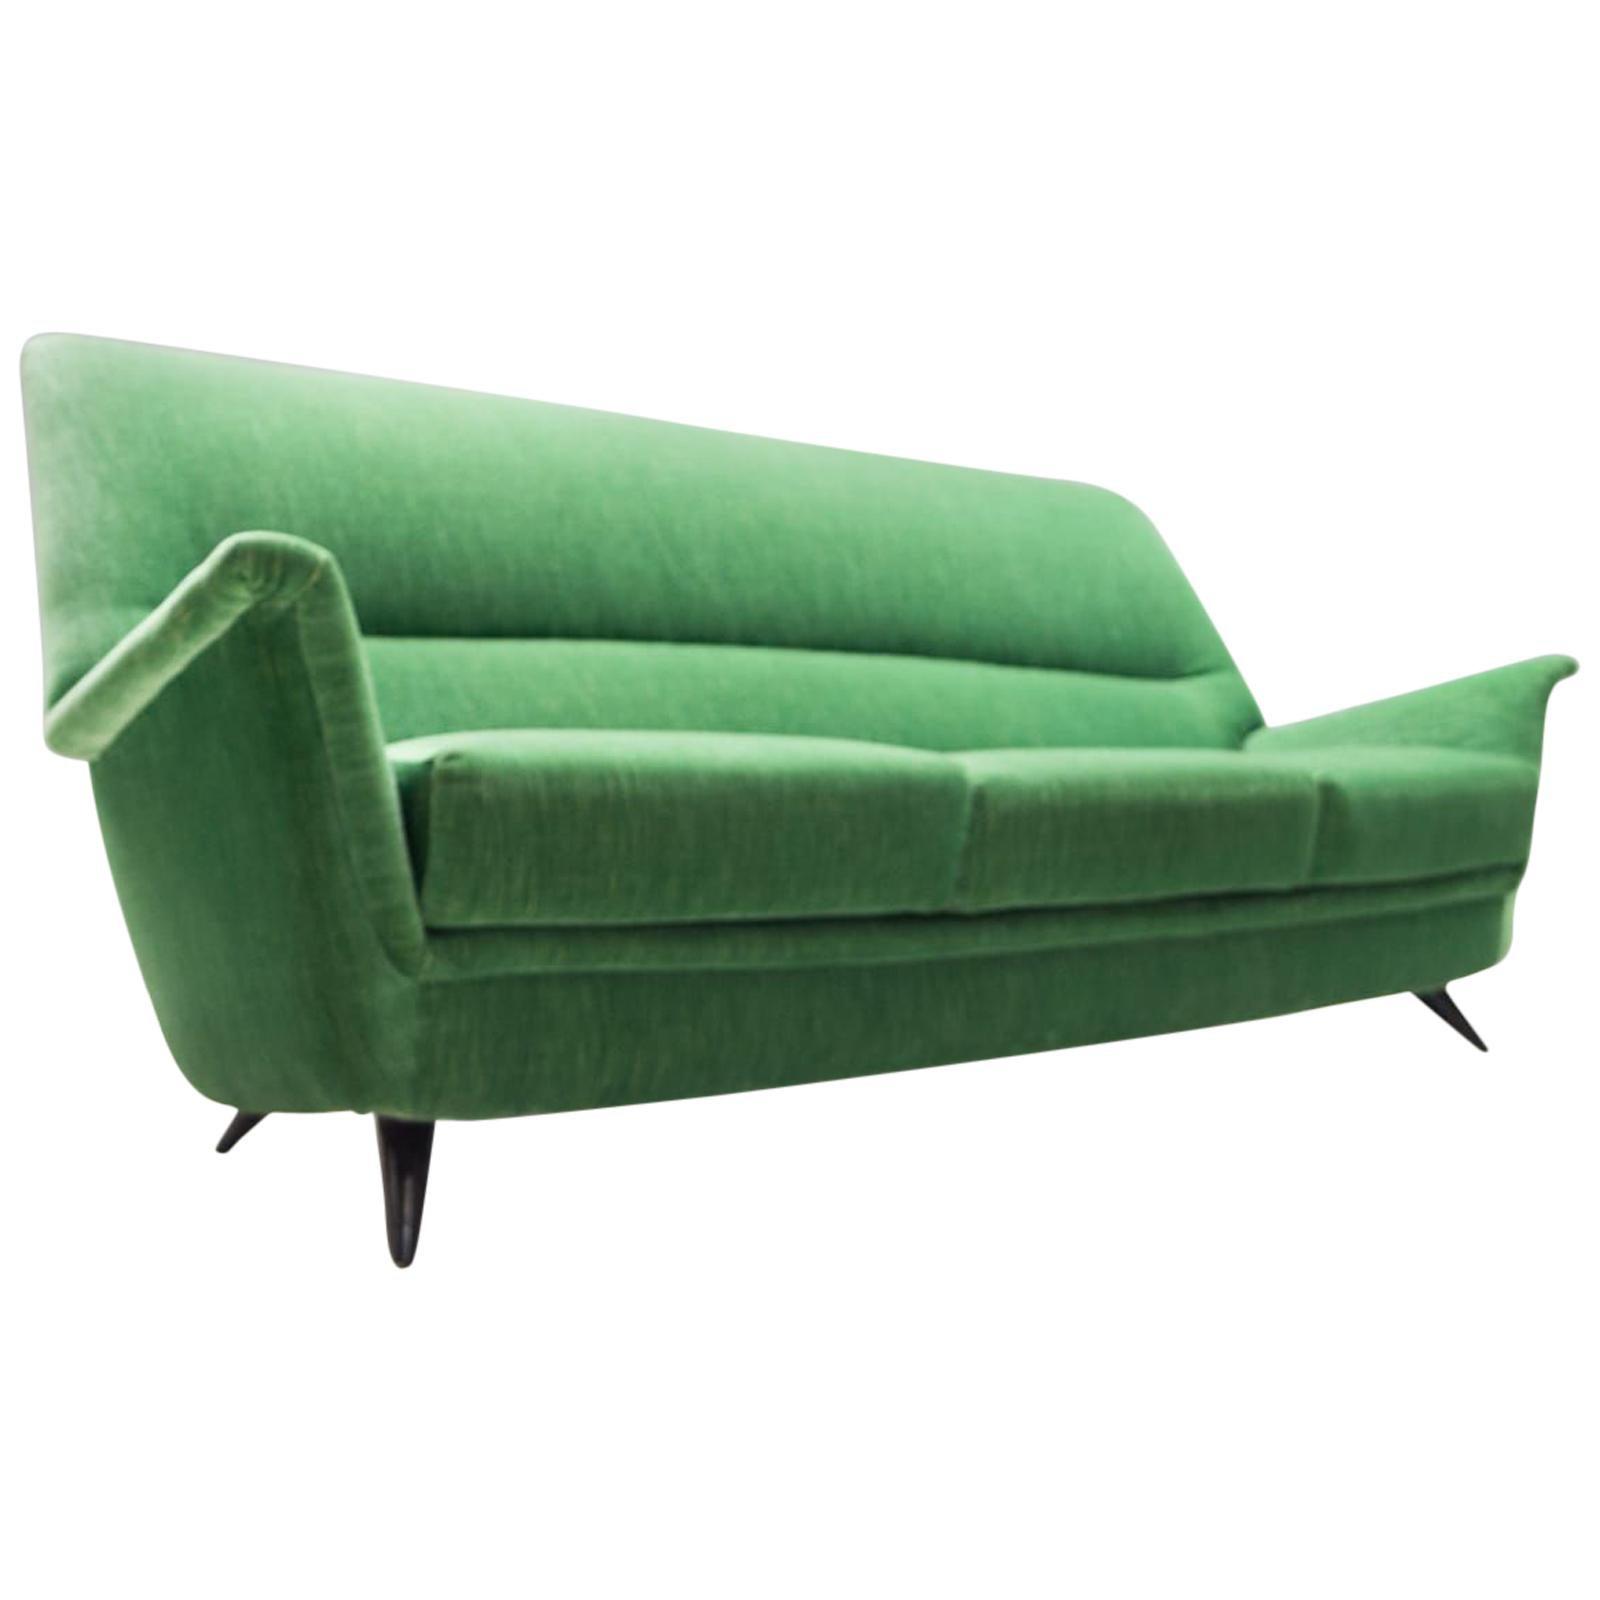 Vintage Italian Green 3-Seat Sofa, 1950s